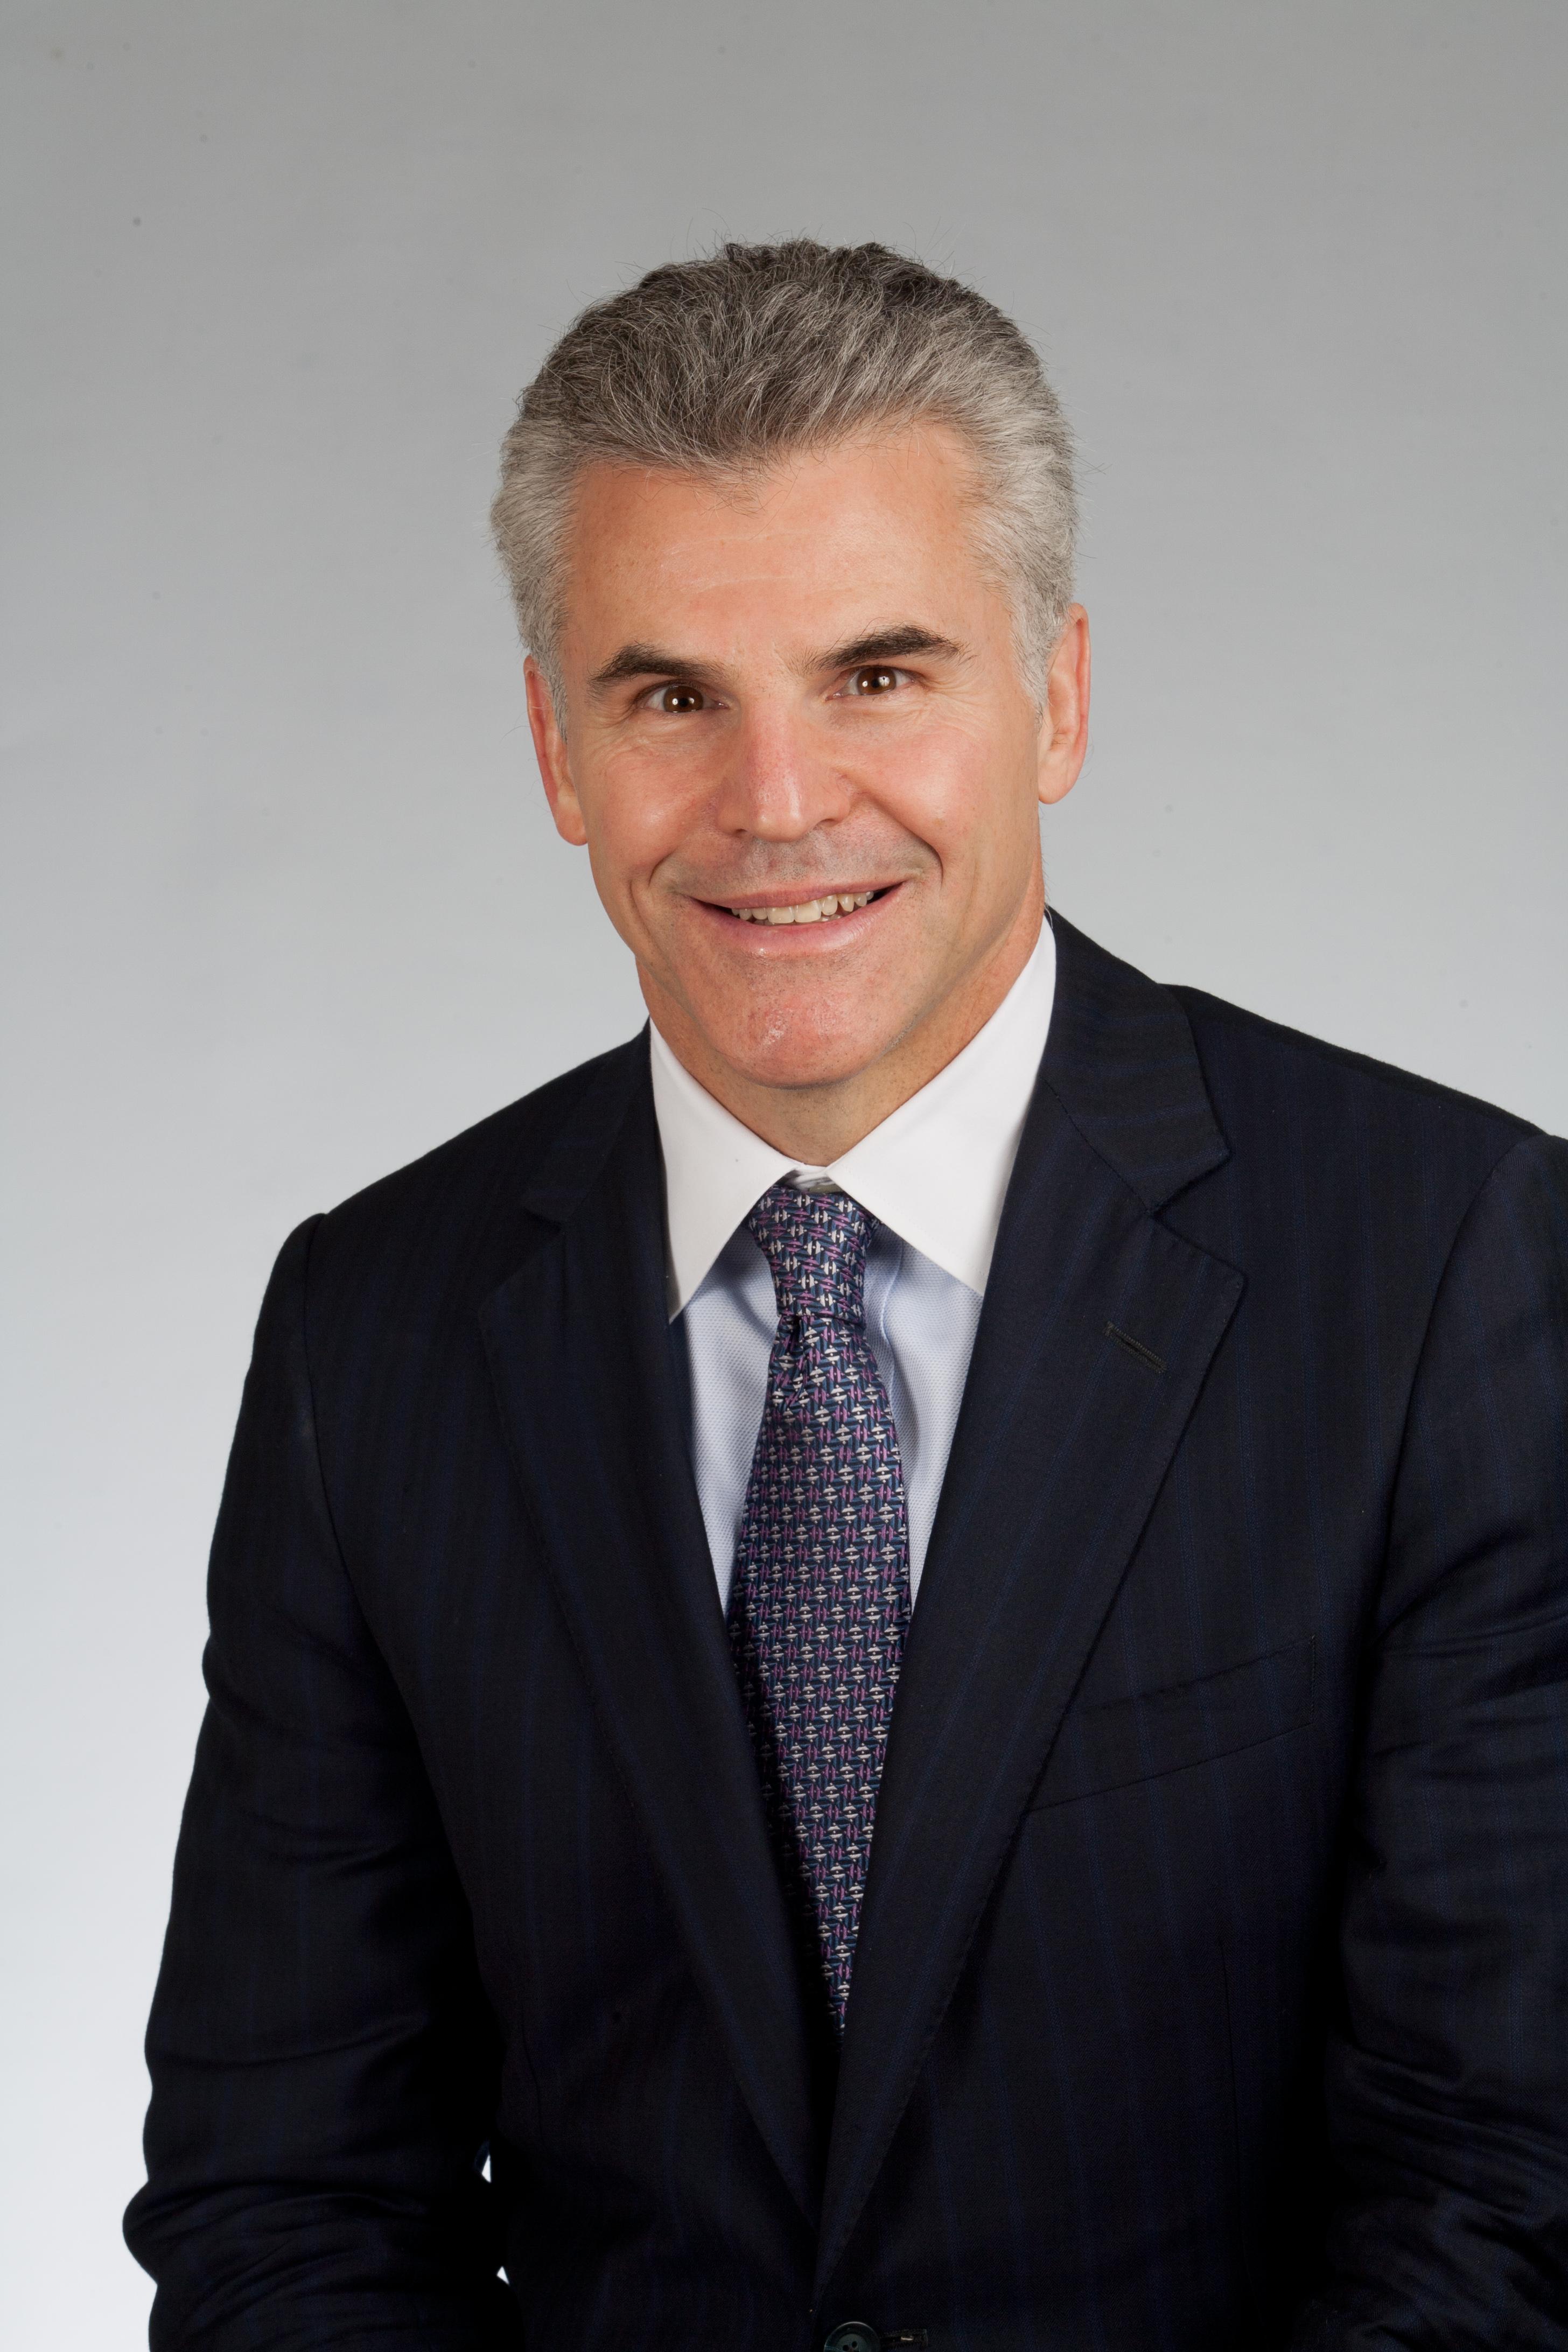 Bruce Cohen, senior managing partner of investments and strategic initiatives, Cortland